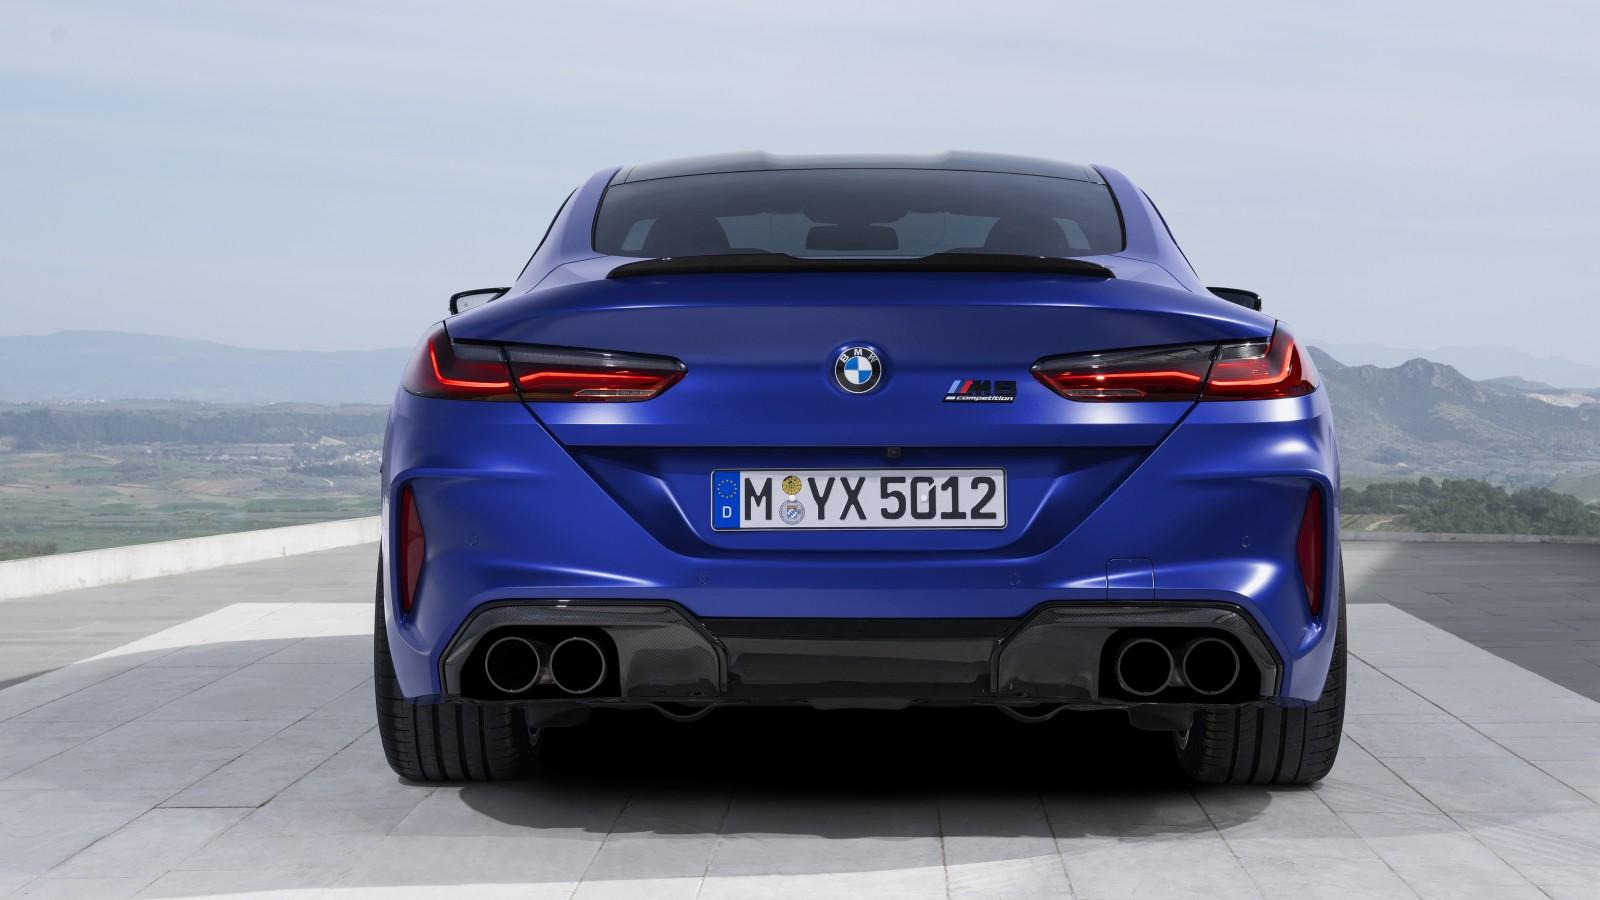 BMW M8 2015 >> BMW M8 Competition Coupe 2019 4K 3 Wallpaper | HD Car ...